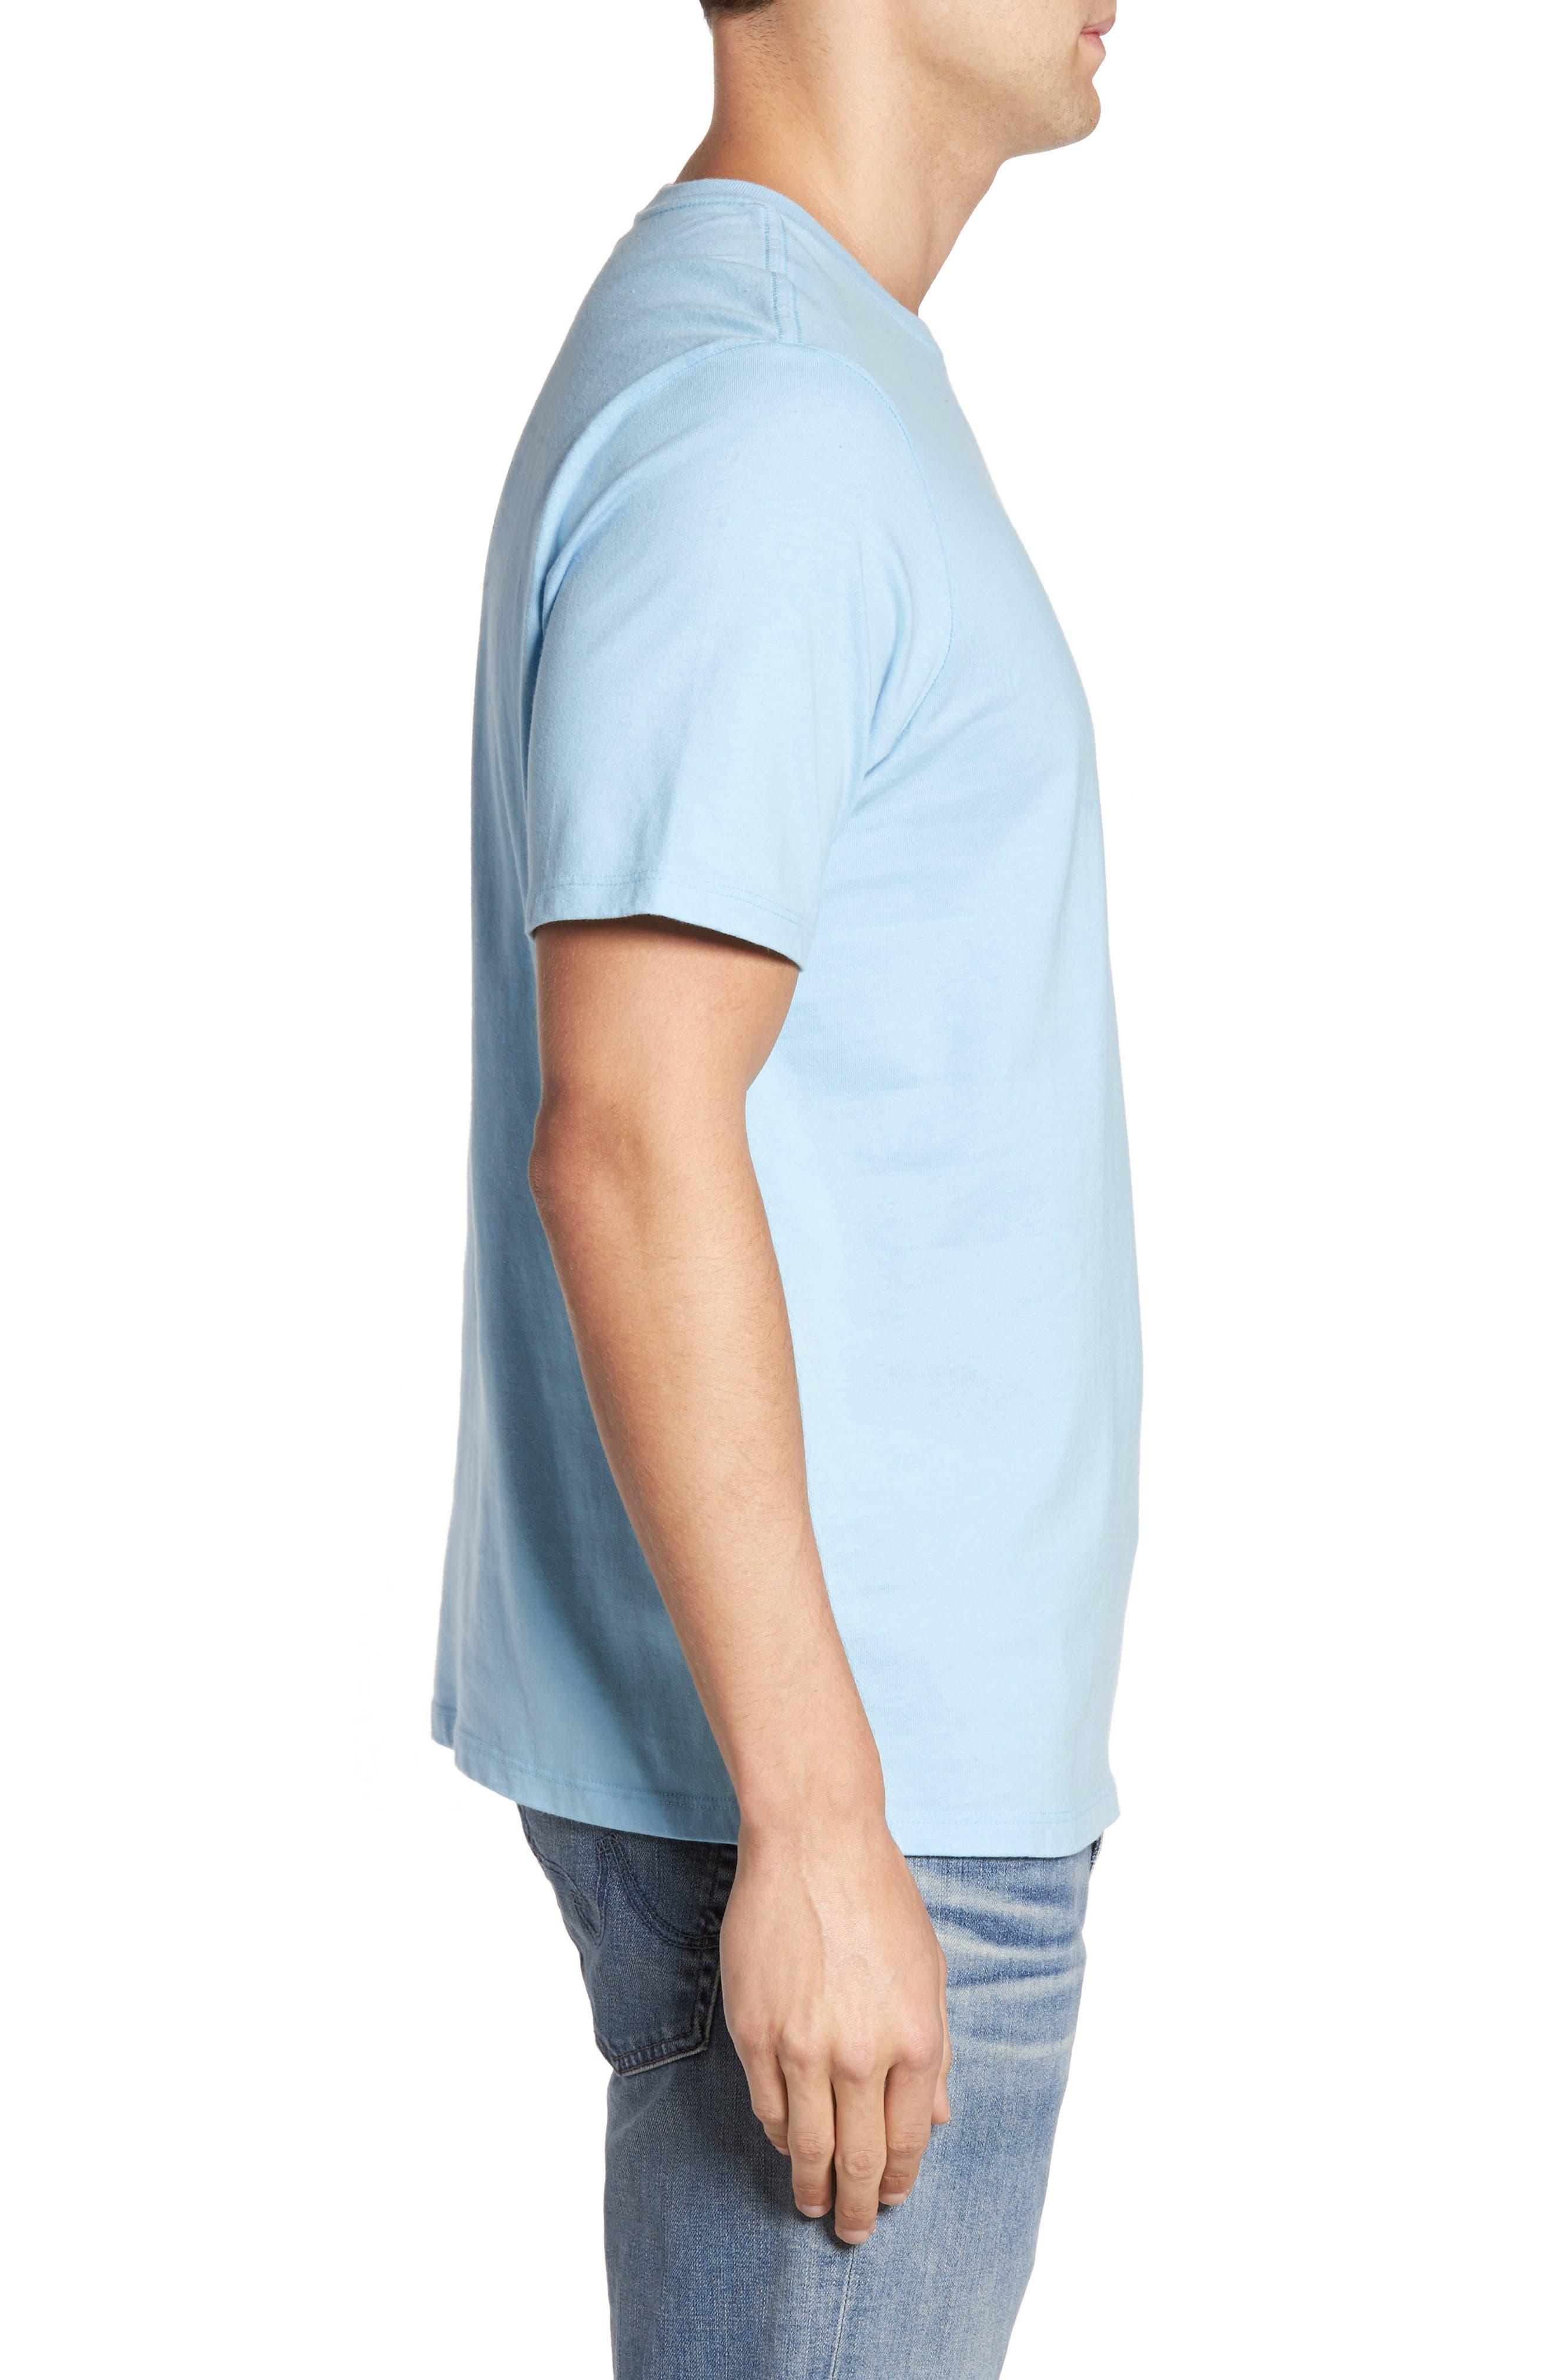 Mr. Ice Guy T-Shirt,                             Alternate thumbnail 3, color,                             400